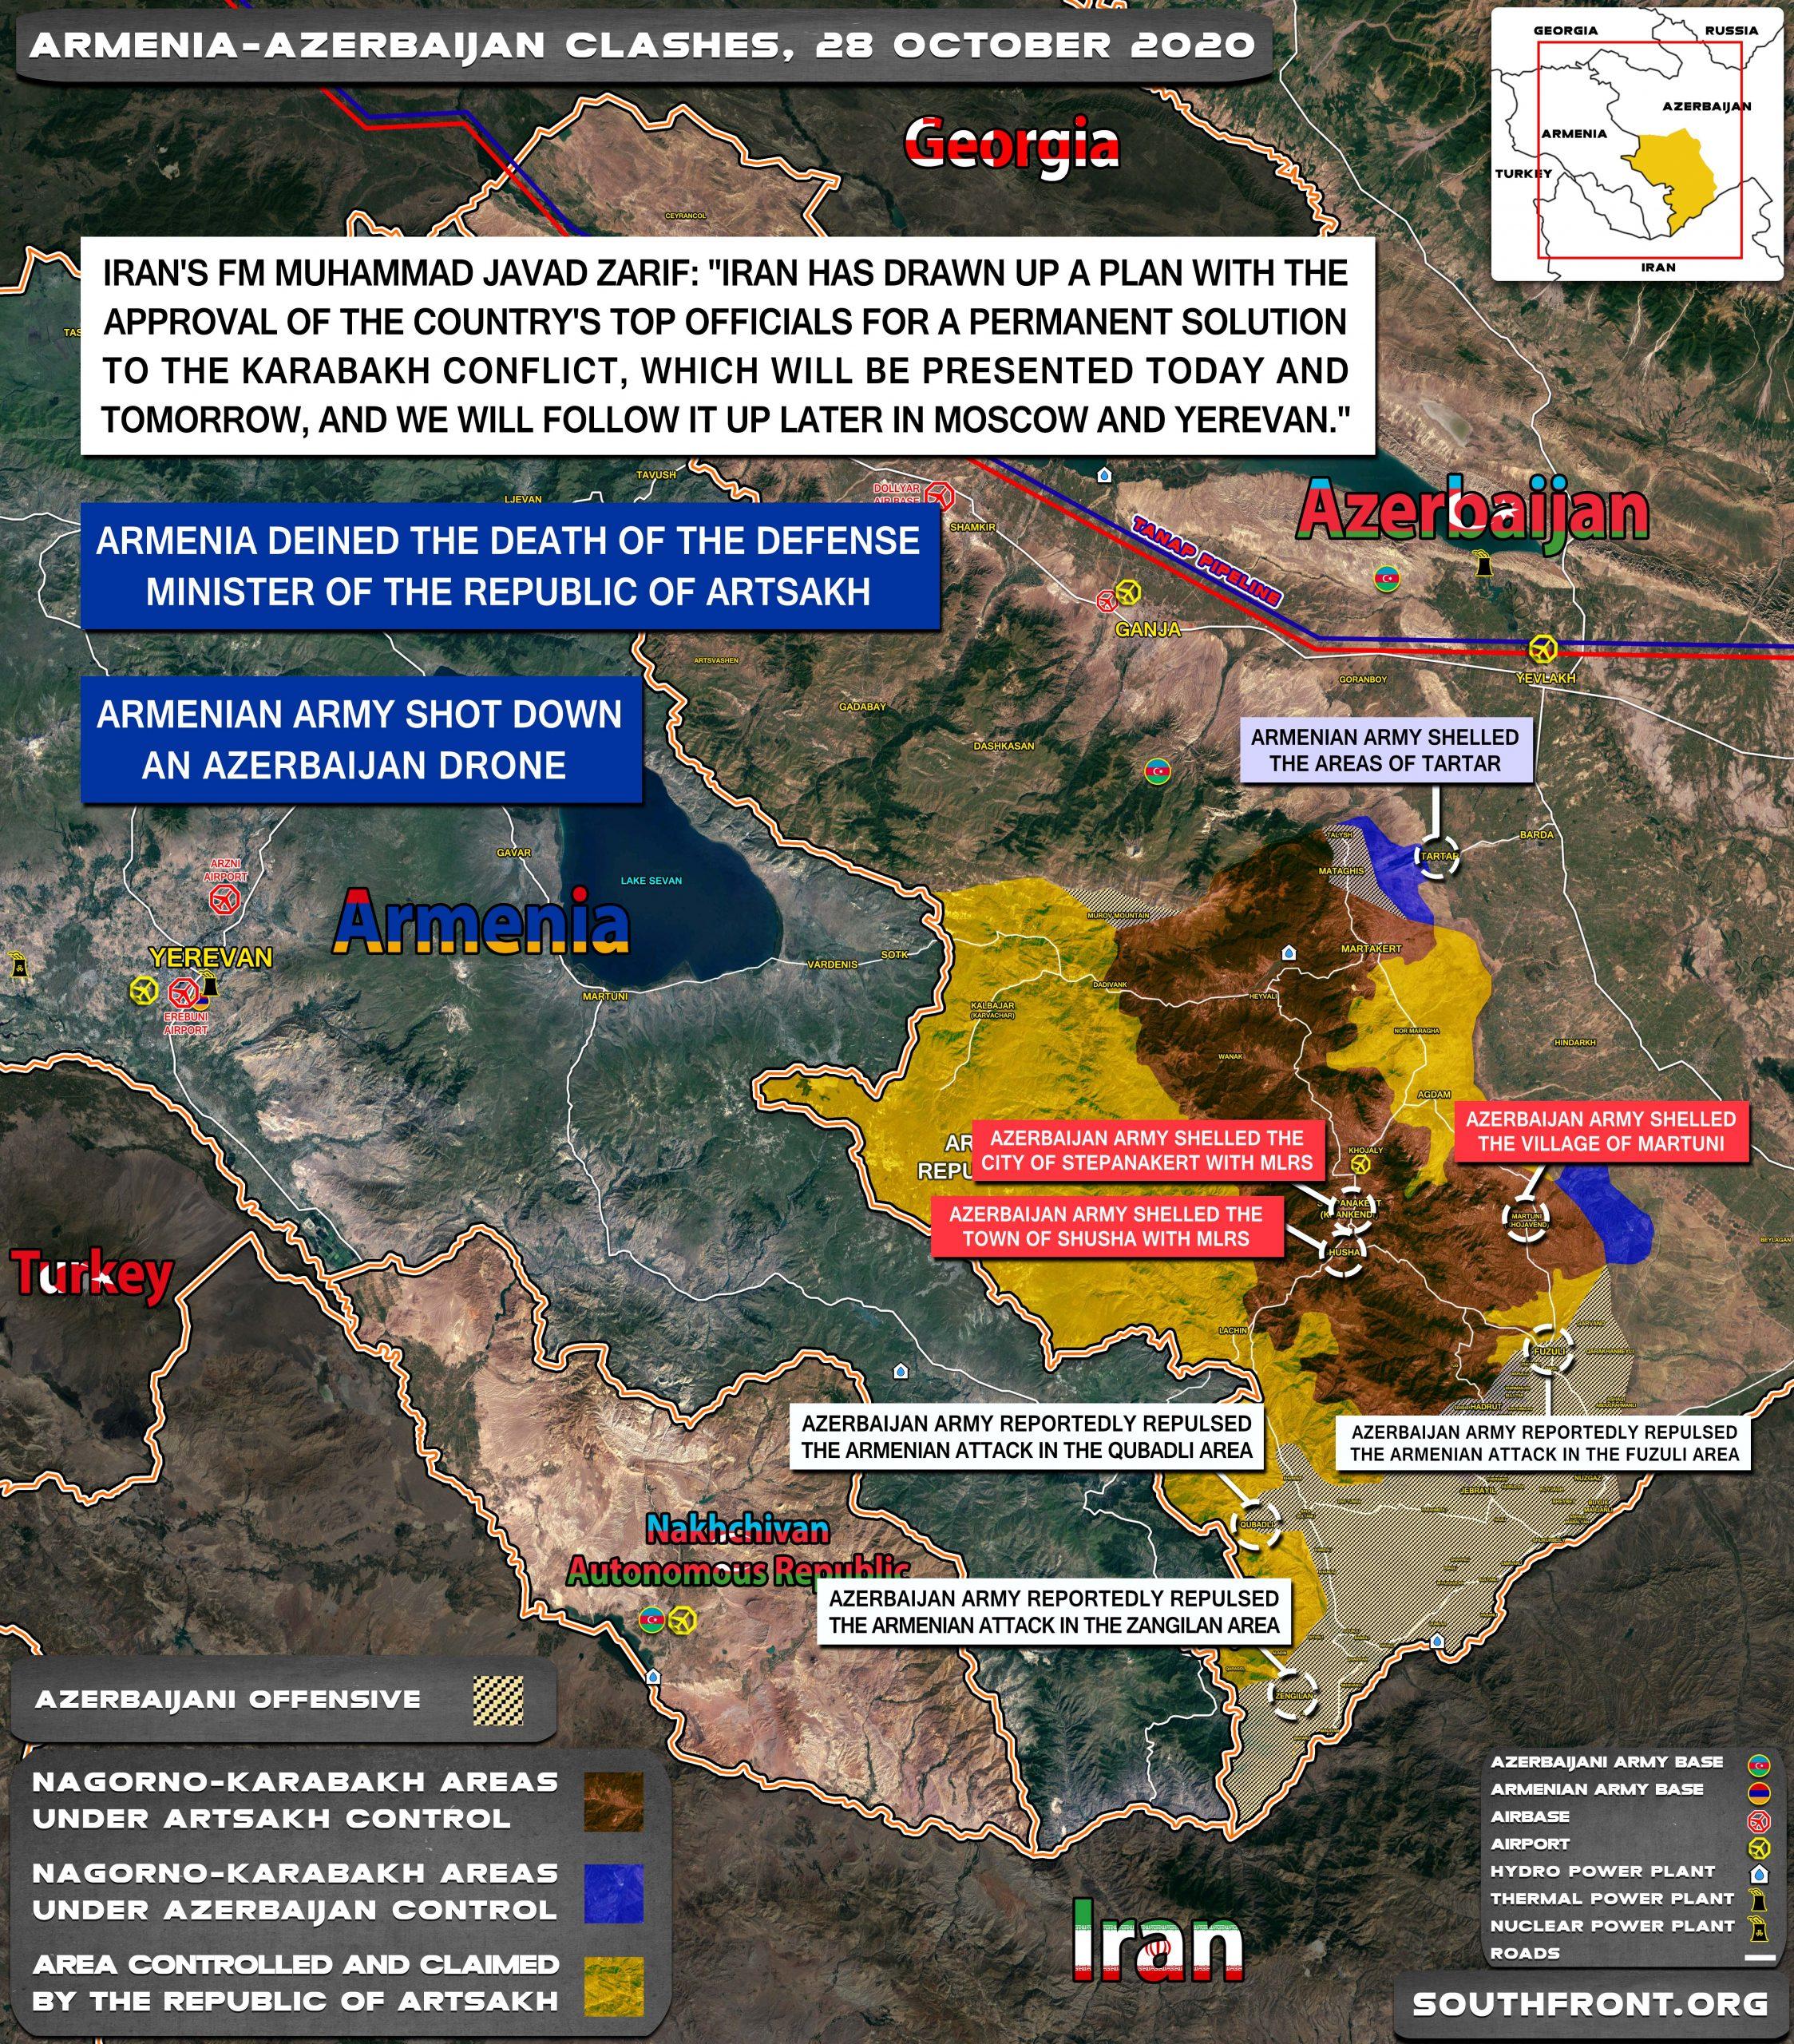 28oct_Azerbaijan_Armenia_map_2-scaled.jpg